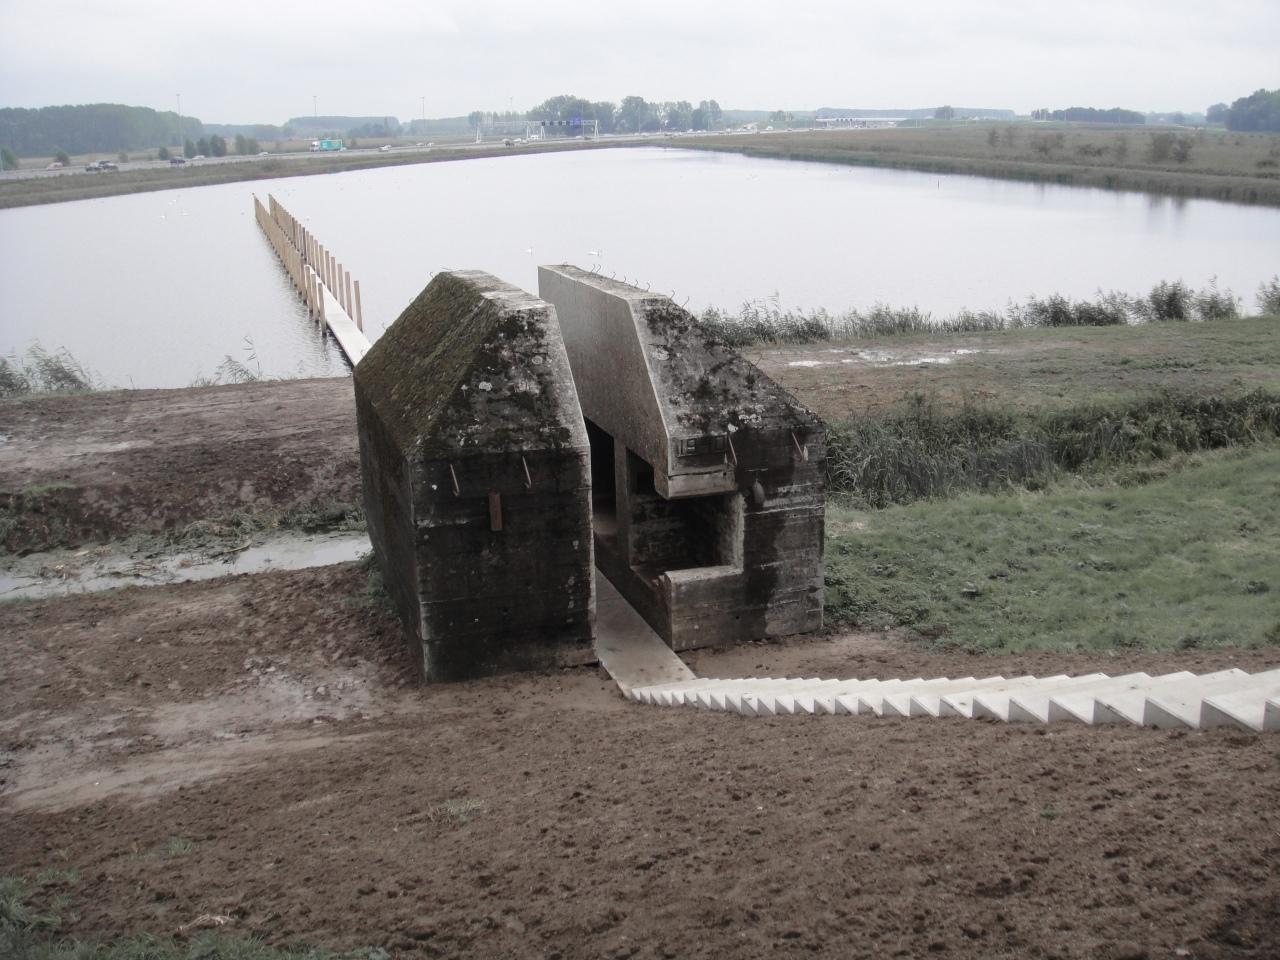 Bunker 599 / Rietveld Landscape + Atelier de Lyon , Cortesia de Rietveld Landscape